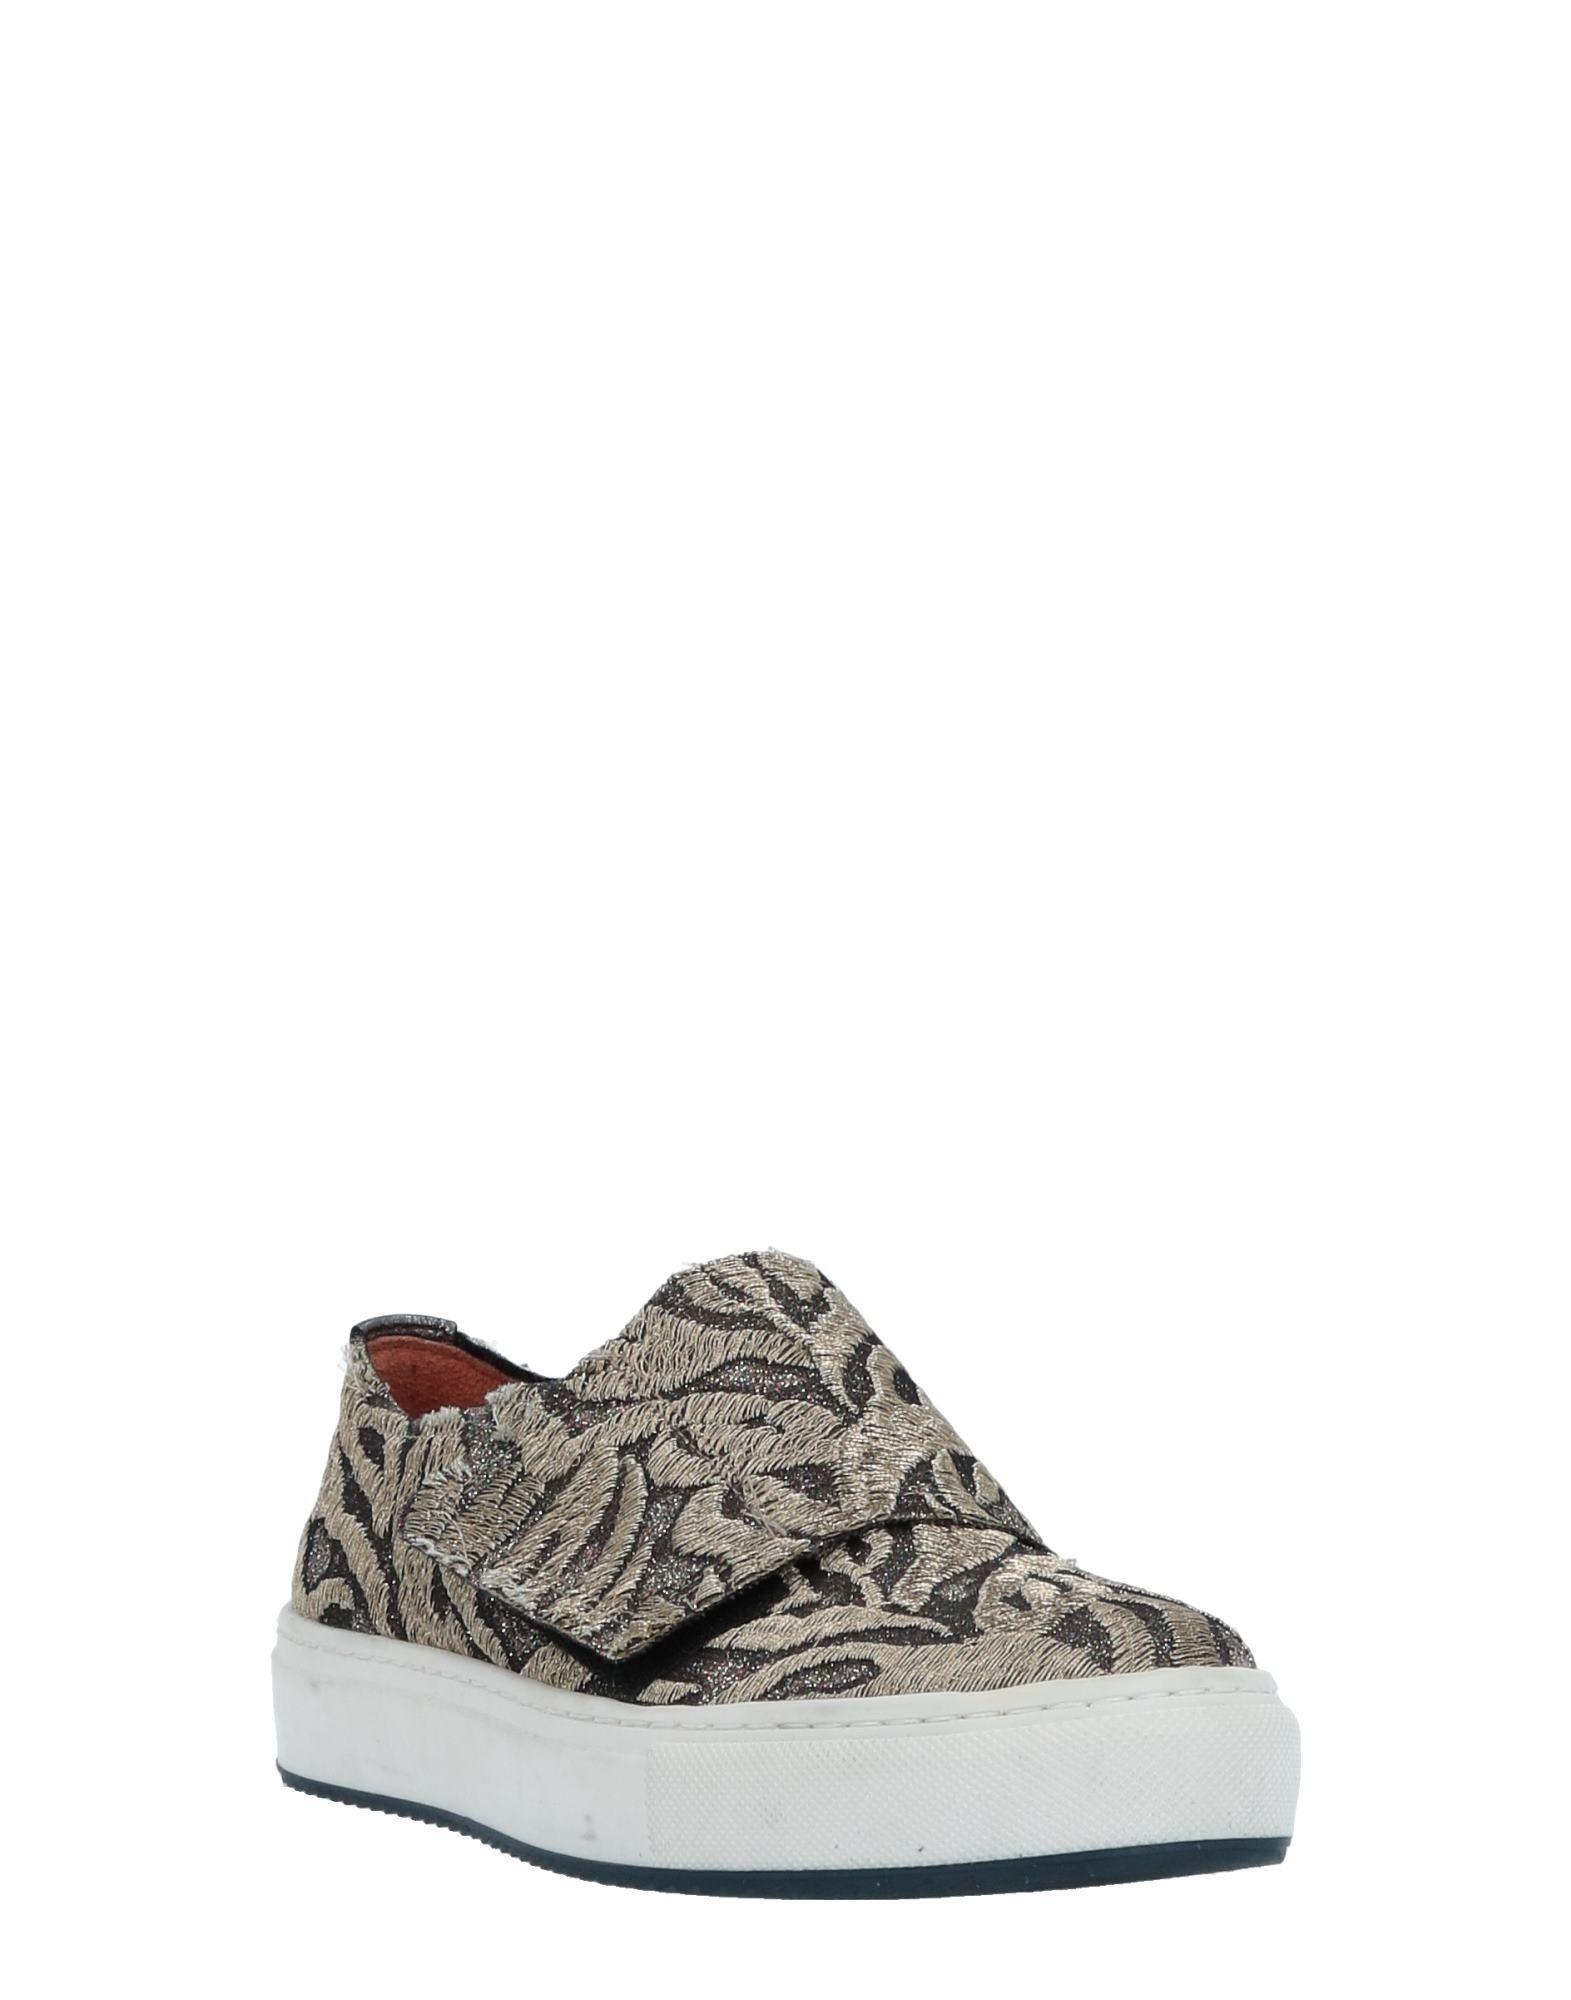 Moda Sneakers Bagatt Donna - - - 11515263AO f8e751